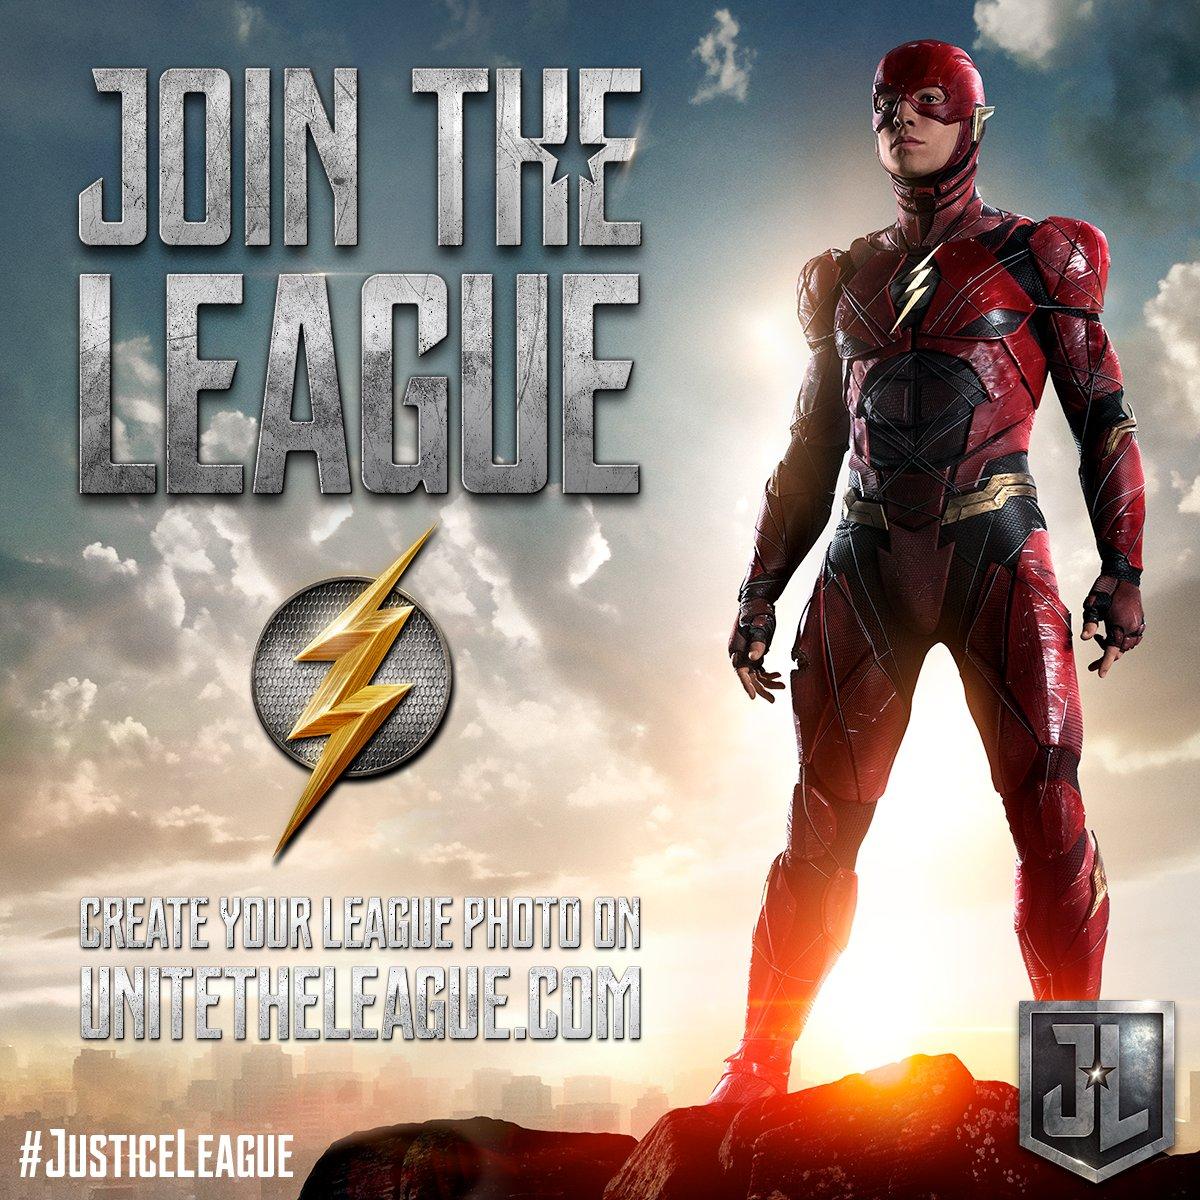 Justice League Movie (@justiceleaguewb) : Twitter